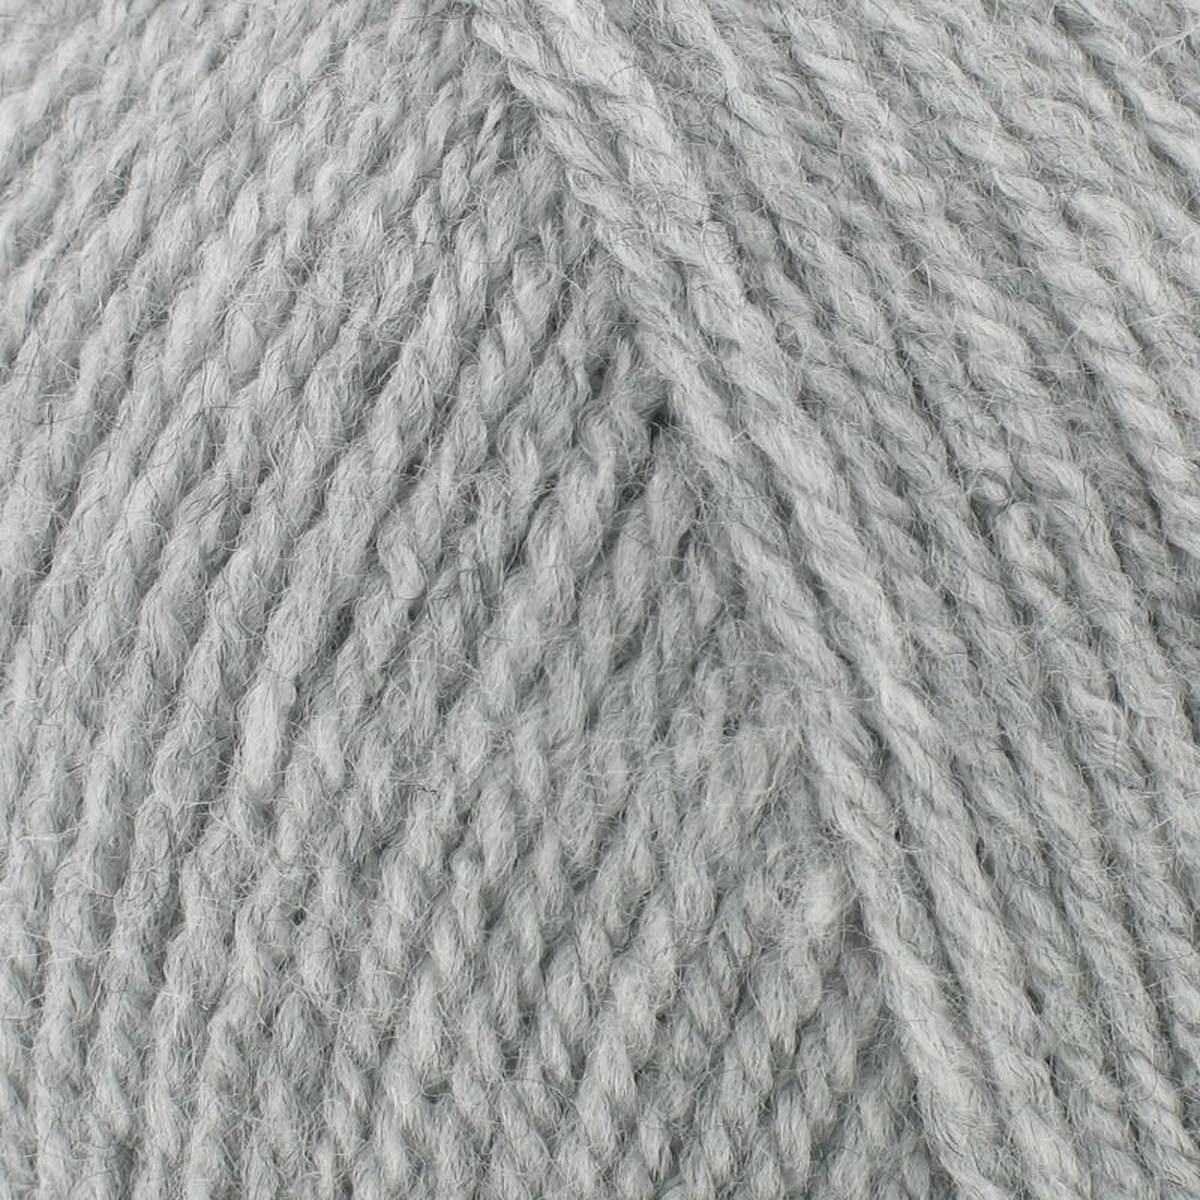 Knitting Yarn Over Twice : Womens institute premium acrylic yarn knitting different